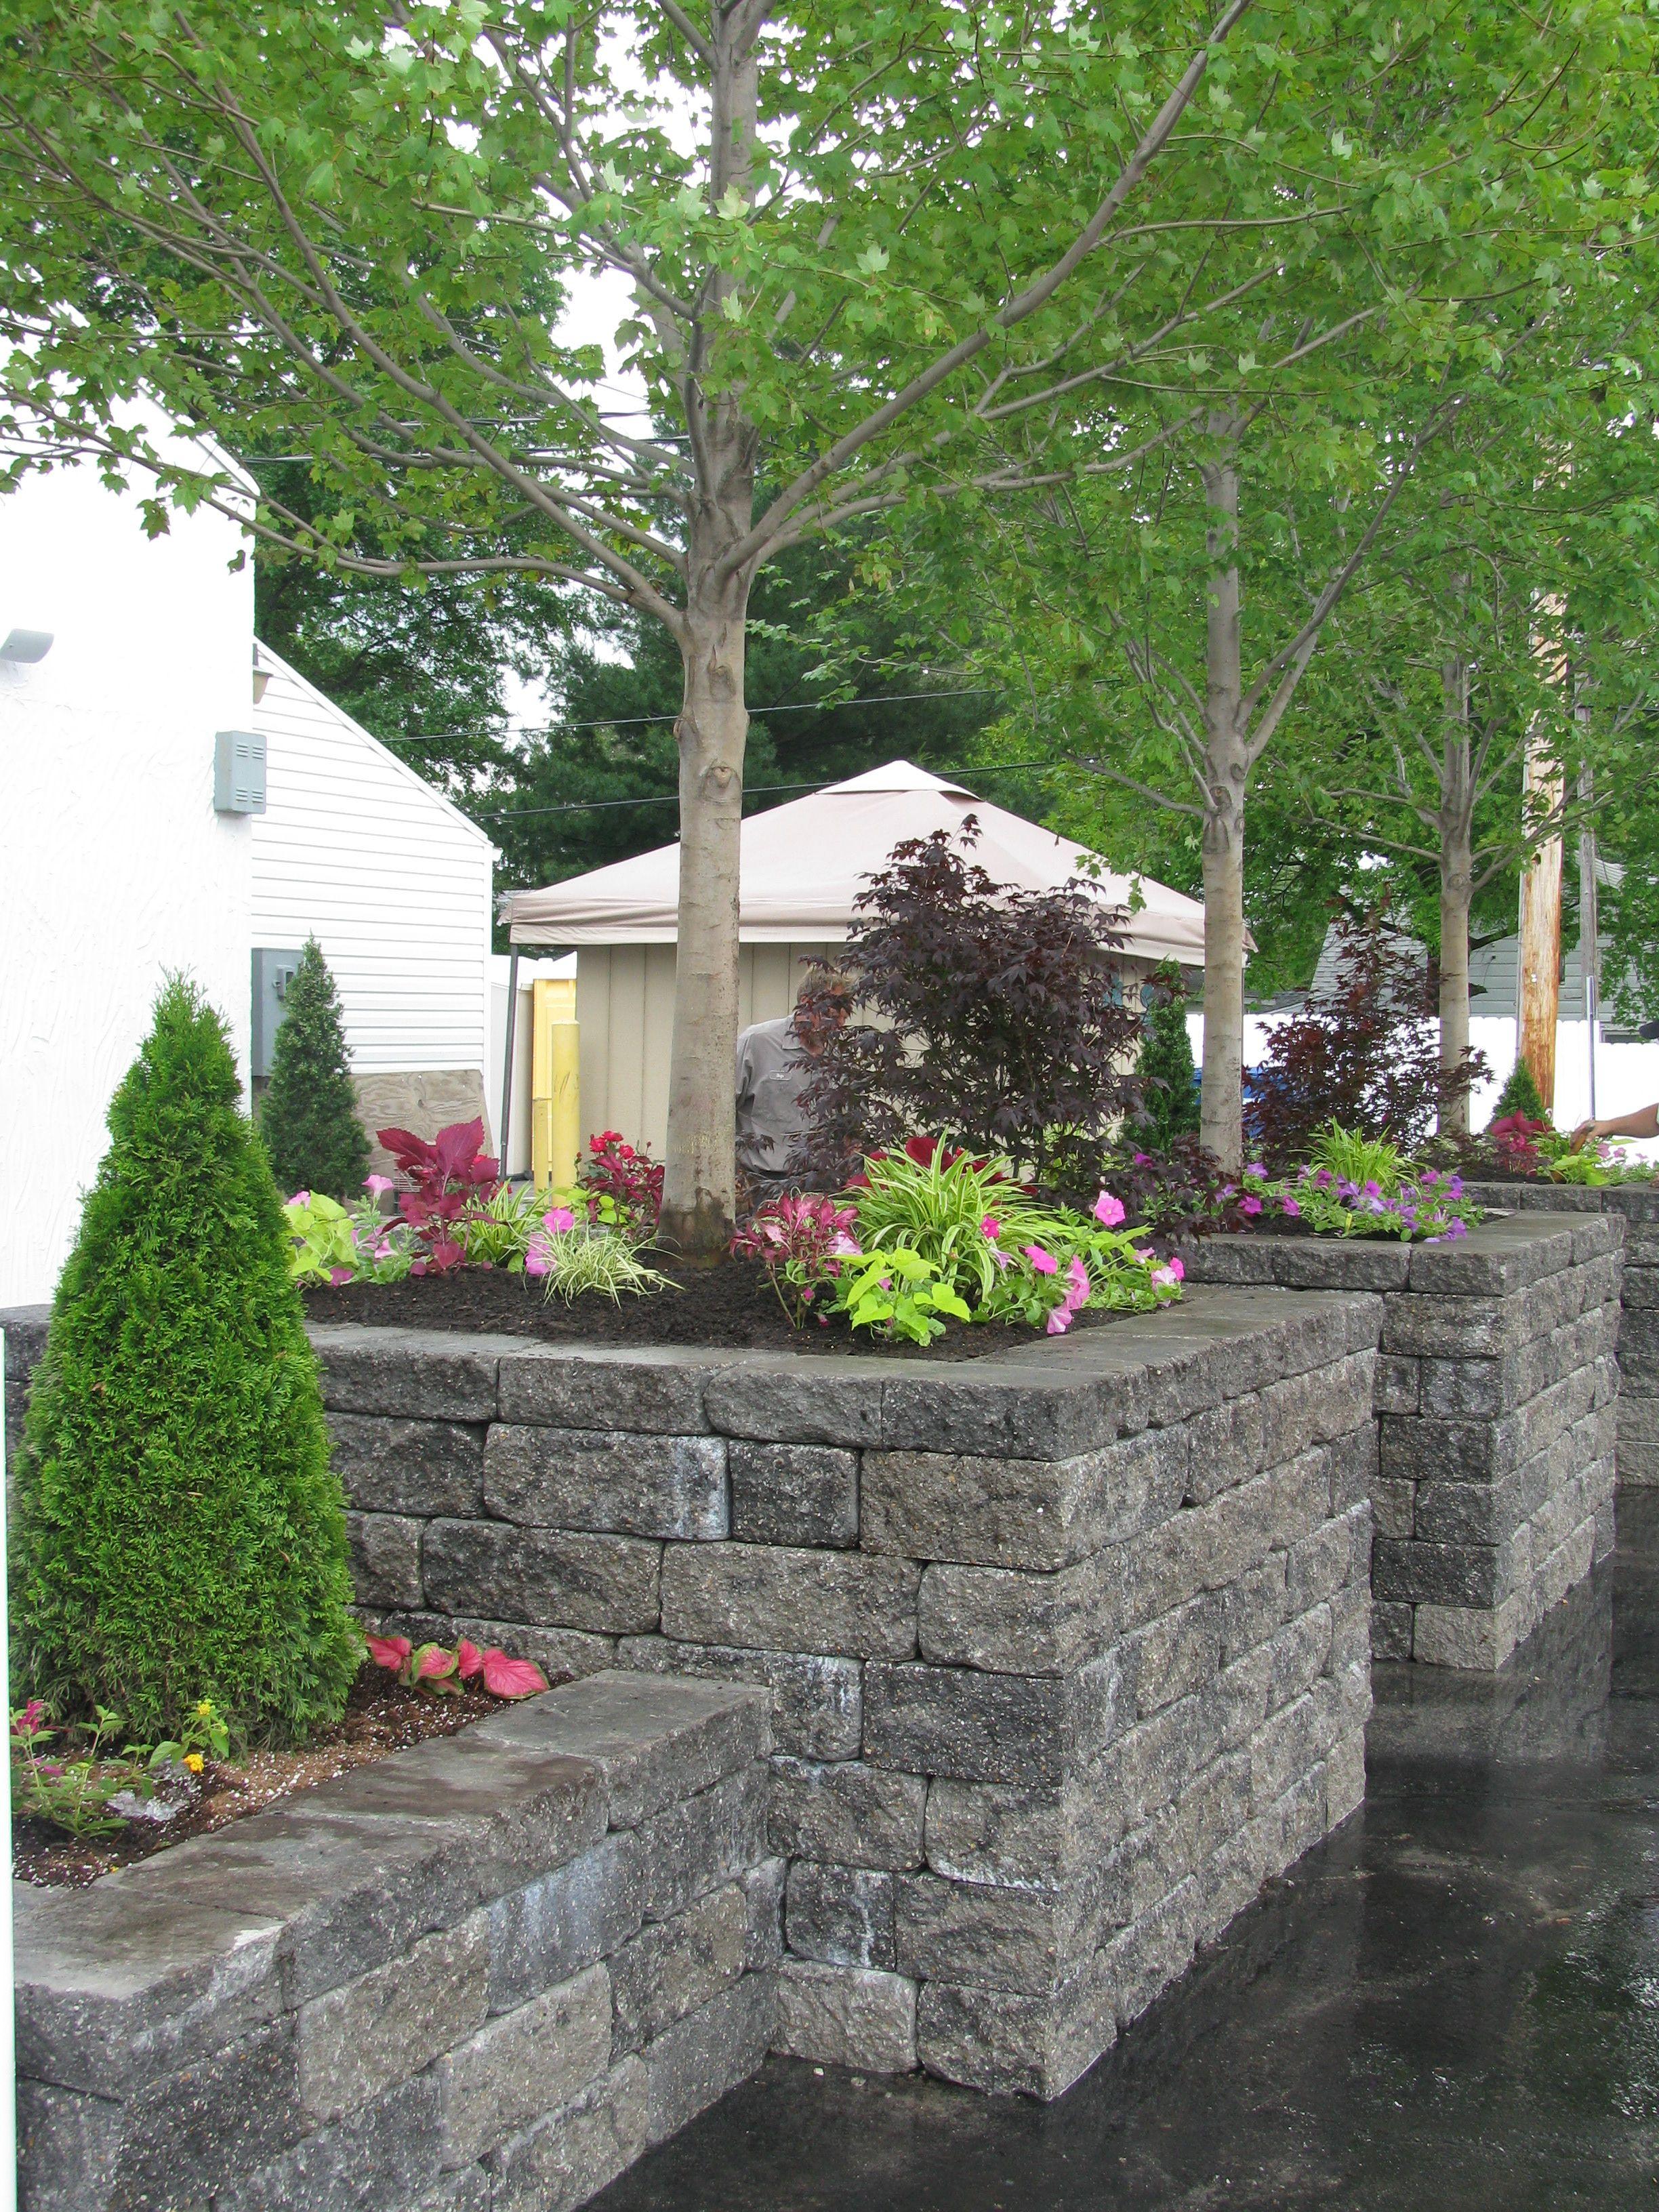 Versa Lockk Block Planter Boxes Hardscape Landscape Architecture Yard Service